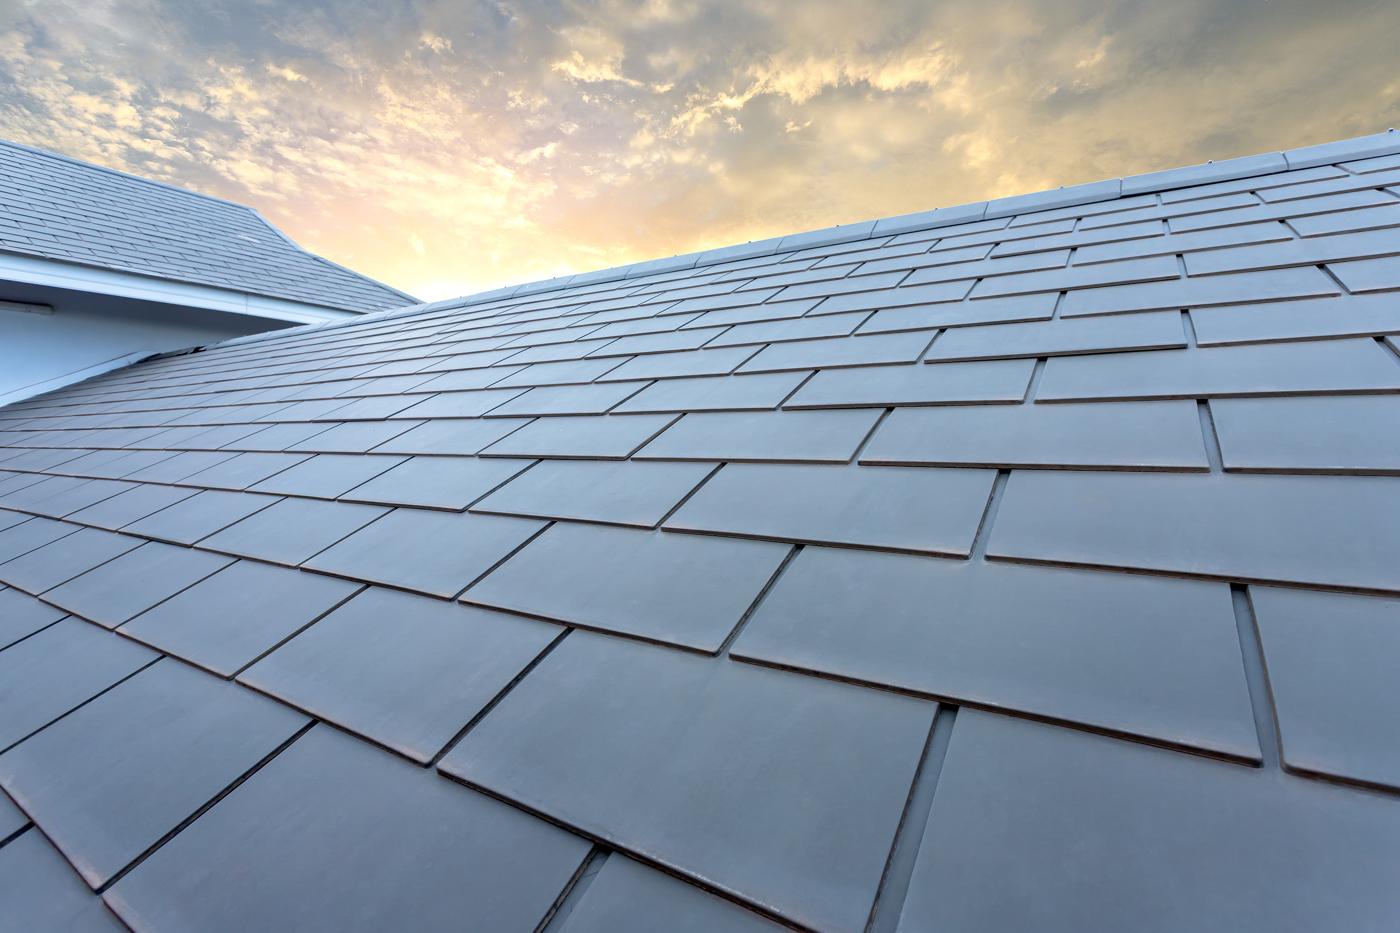 Construction stocks, home construction stocks, building stocks, roofing stocks